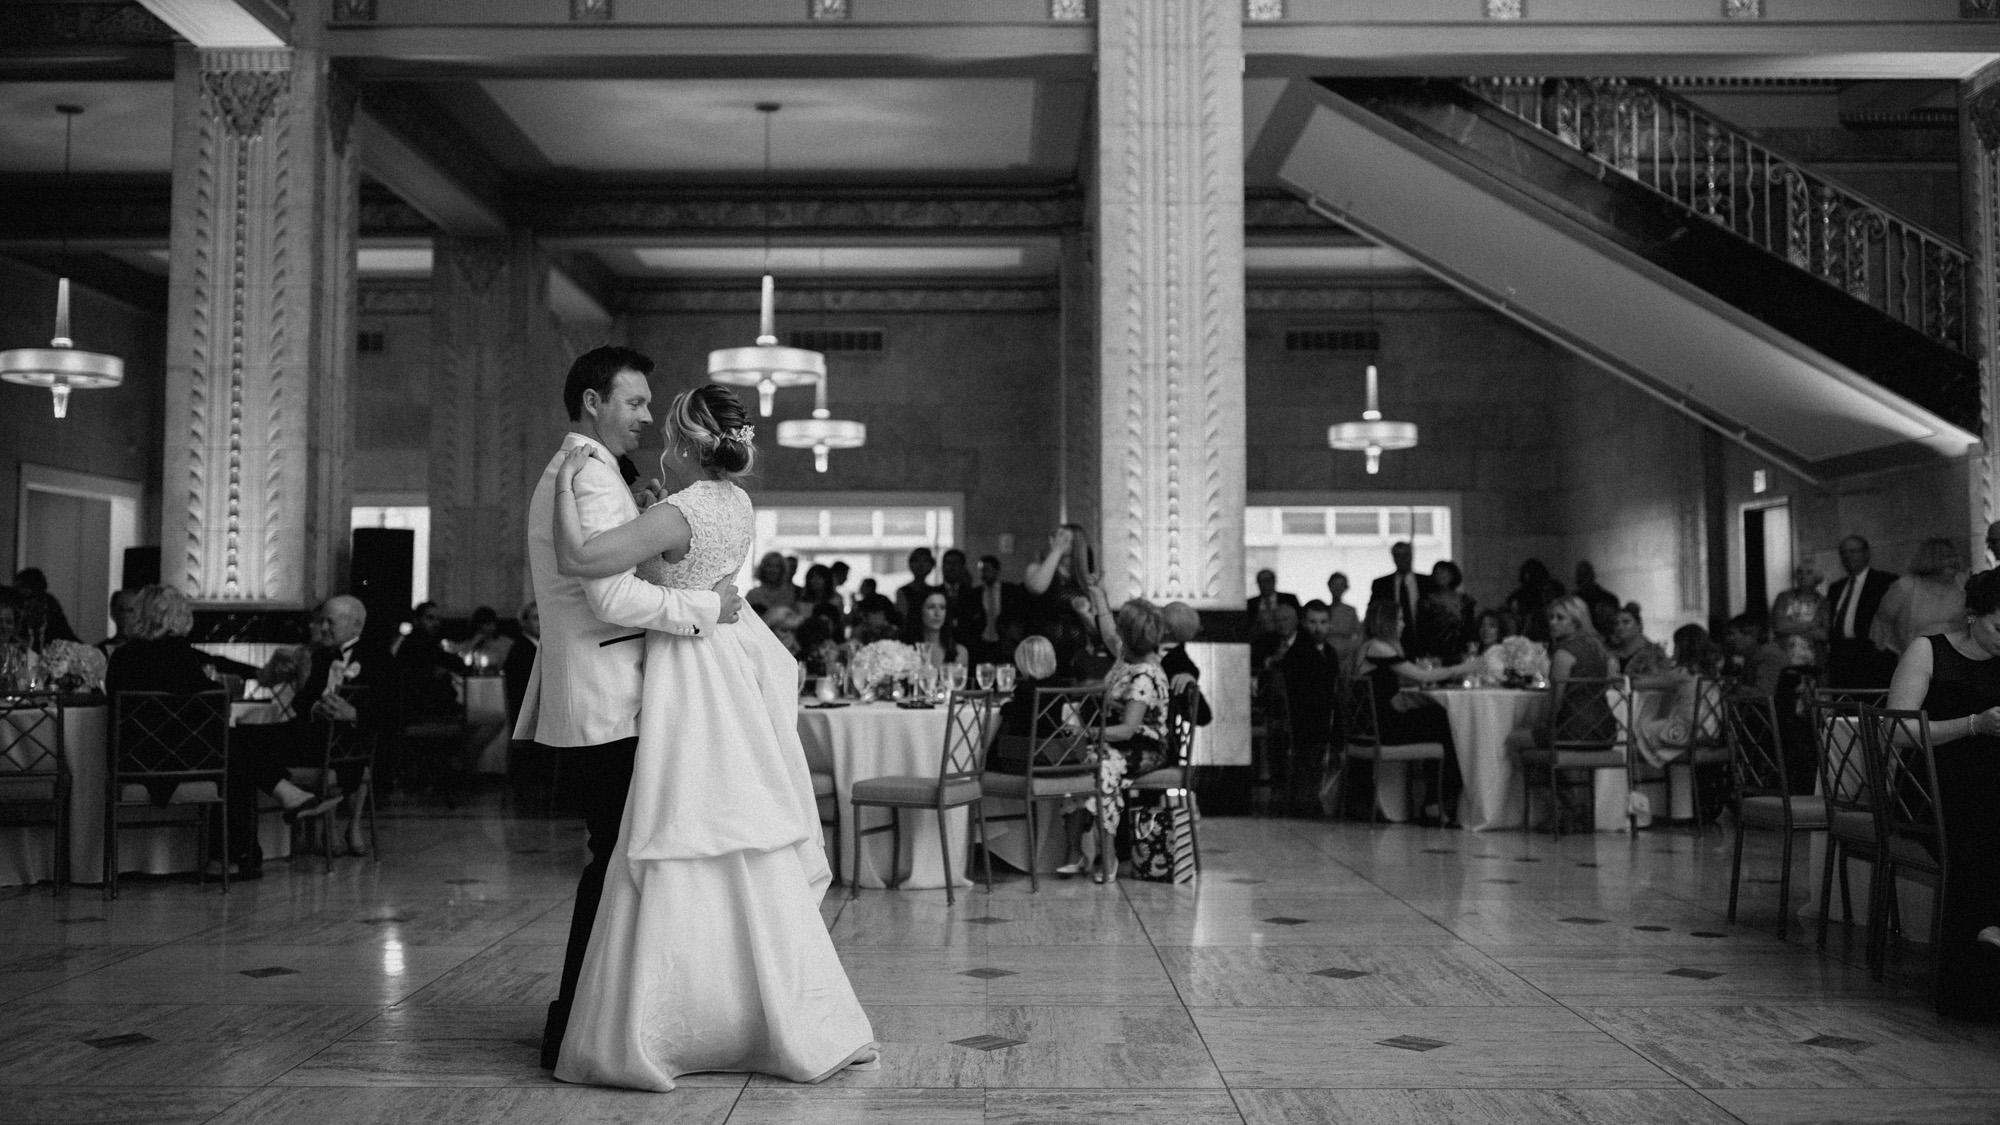 Alec_Vanderboom_kansas_city_hip_wedding_photos-0061.jpg